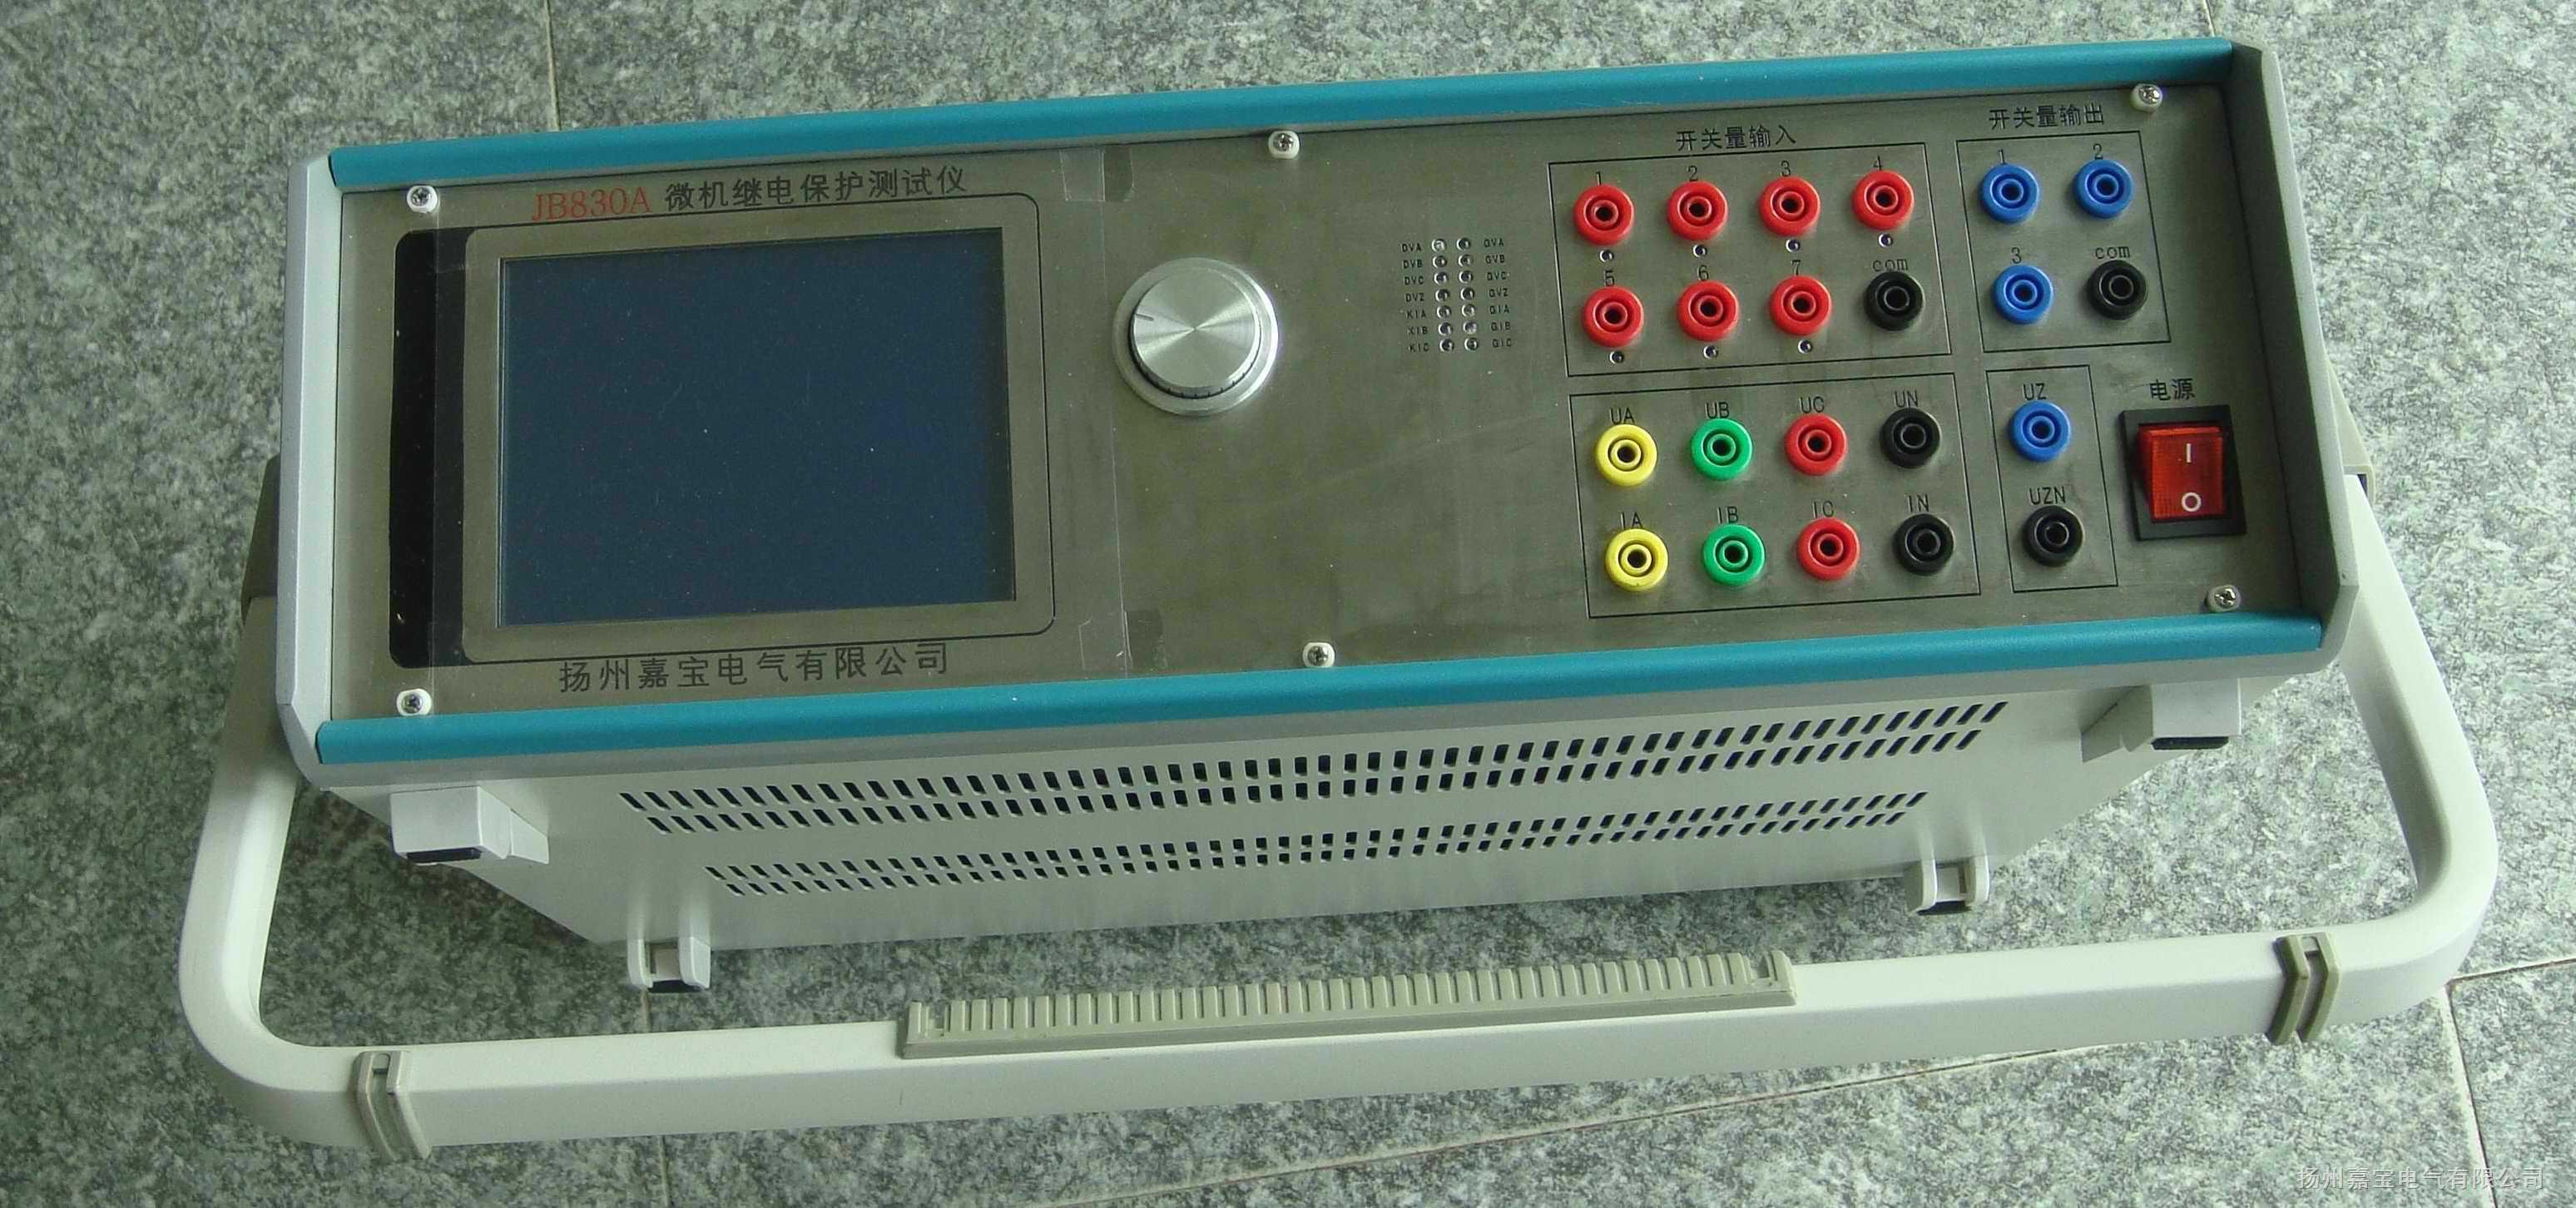 JB838微机继电保护测试系统  微机继电保护测试系统可对各类型电压、电流、频率、功率、阻抗、谐波、差动、同期等继电器以手动或自动方式进行测试,可模拟各种故障类型进行距离、零序保护装置定值校验和保护装置的整组试验,可自动扫描微机和数字型变压器、发变组差动保护比率制动曲线,具备GPS触发功能。  微机继电保护测试系统采用了8.